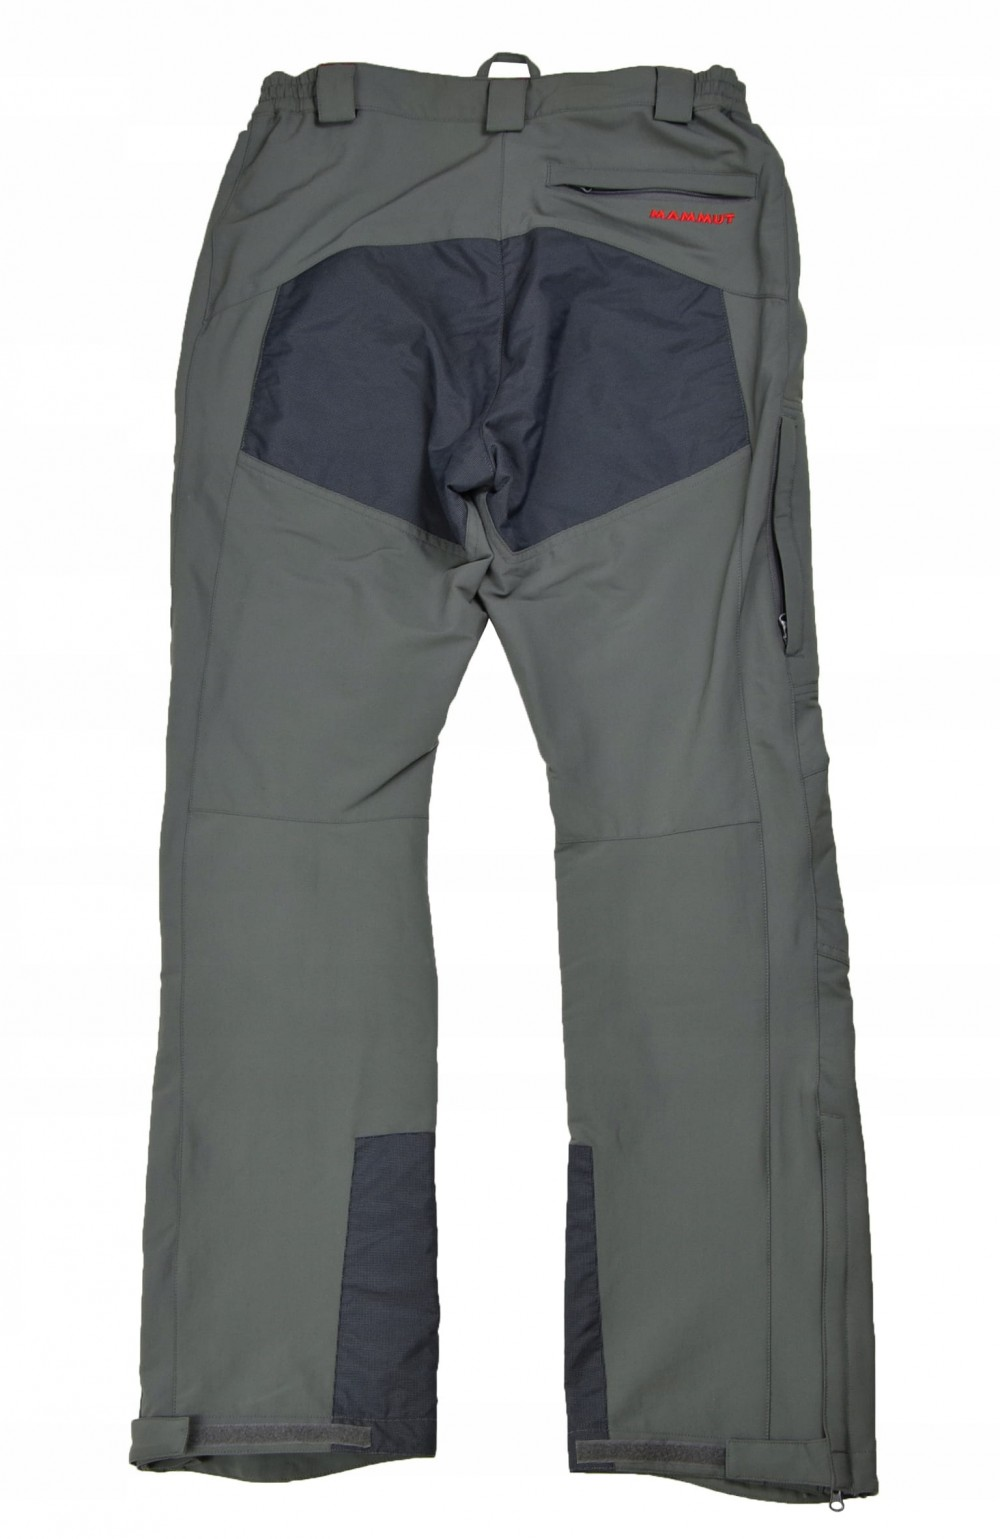 Штаны MAMMUT 3xdry outdoor pants (размер 48-M/L) - 1